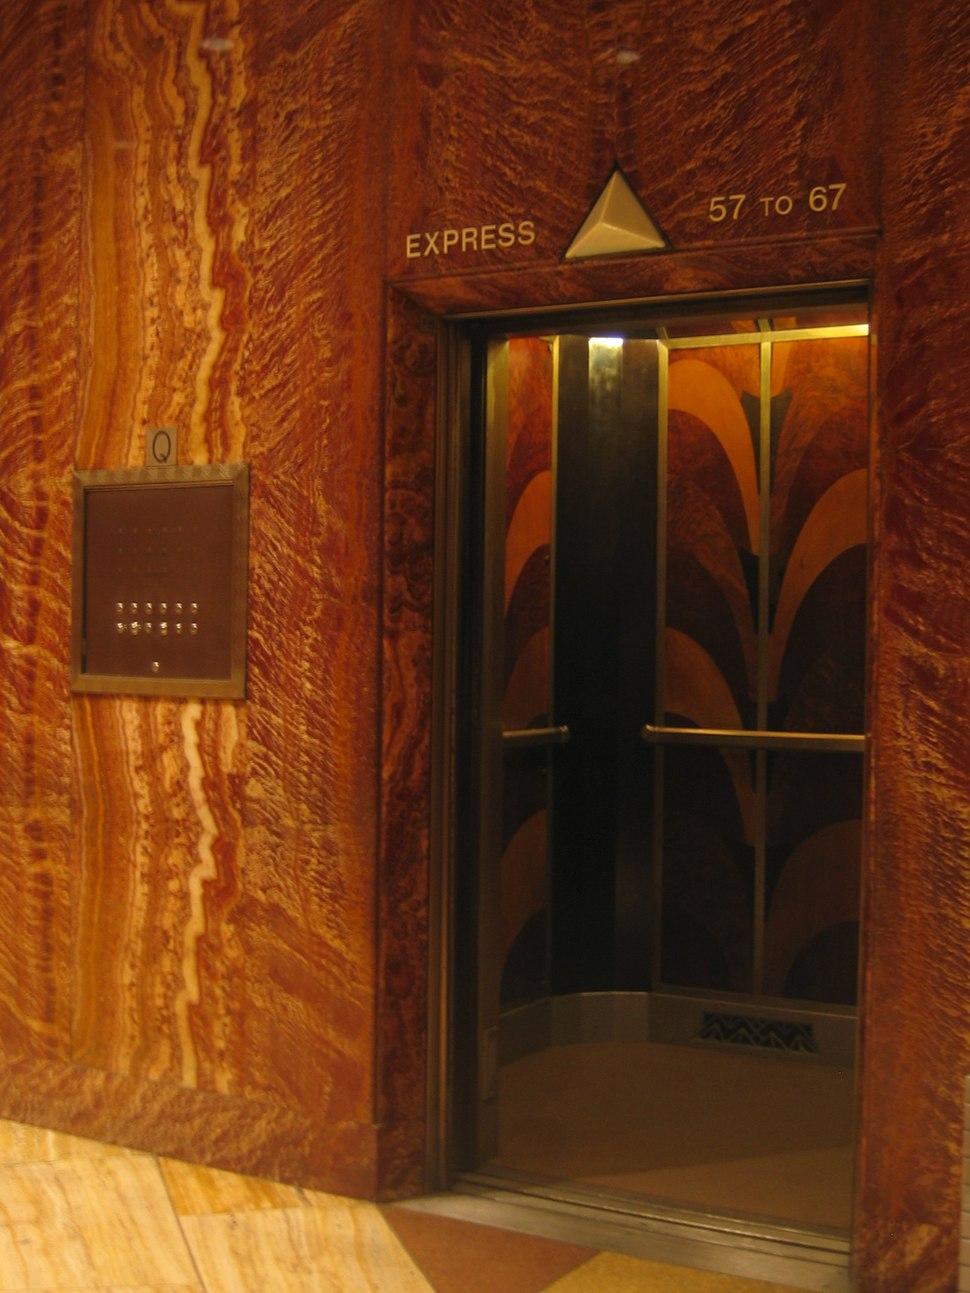 Chrysler express elevator